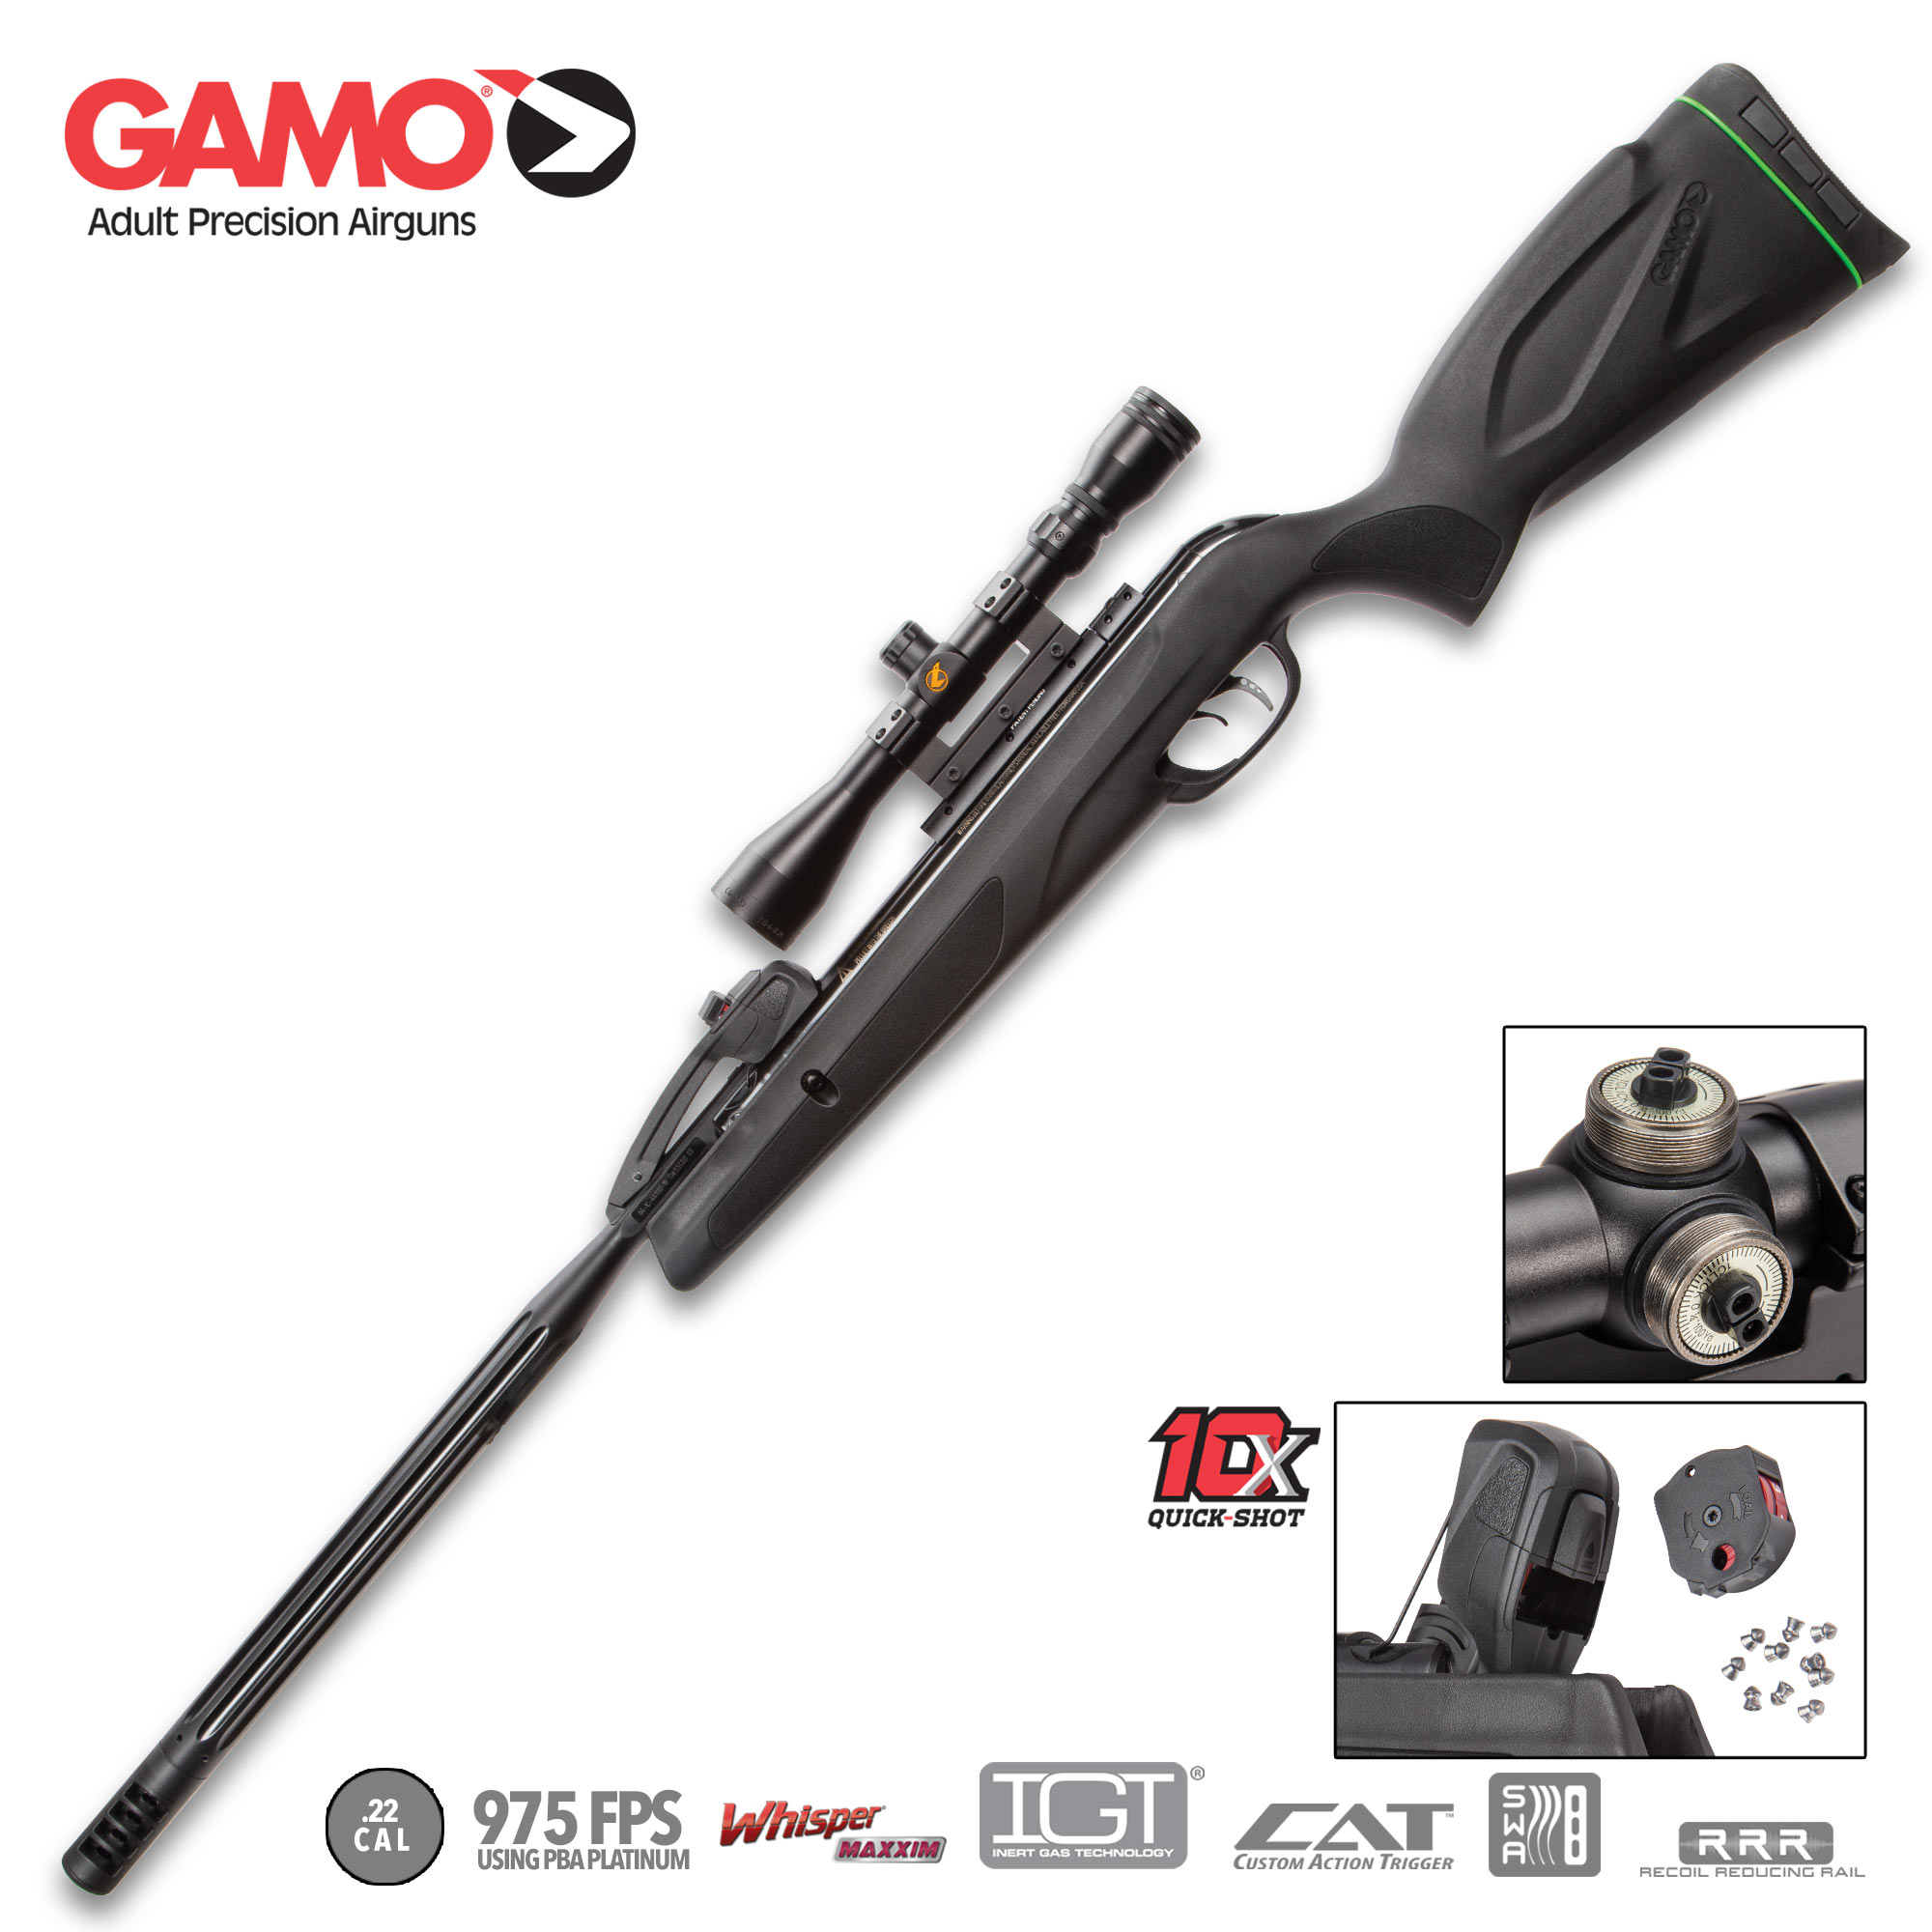 Gamo Swarm Maxxim  22 Caliber Air Rifle With Scope, 975 FPS